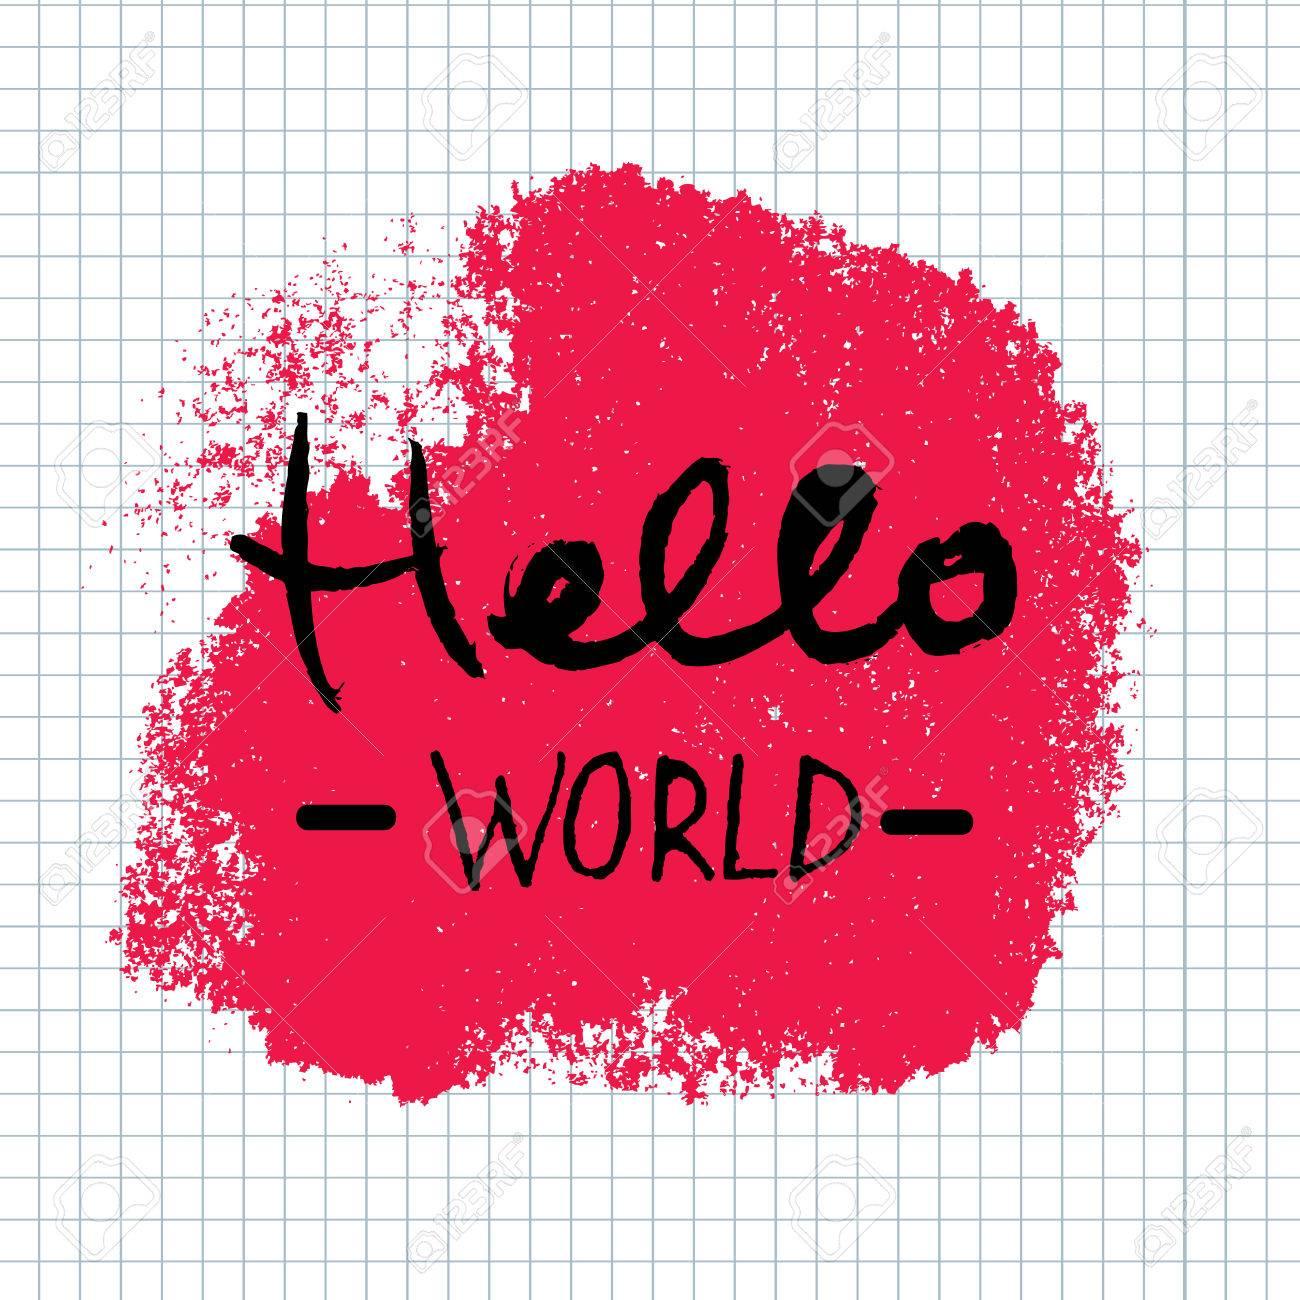 hello world lettering calligraphy hand written decorative word hand written decorative word design element banner phrase